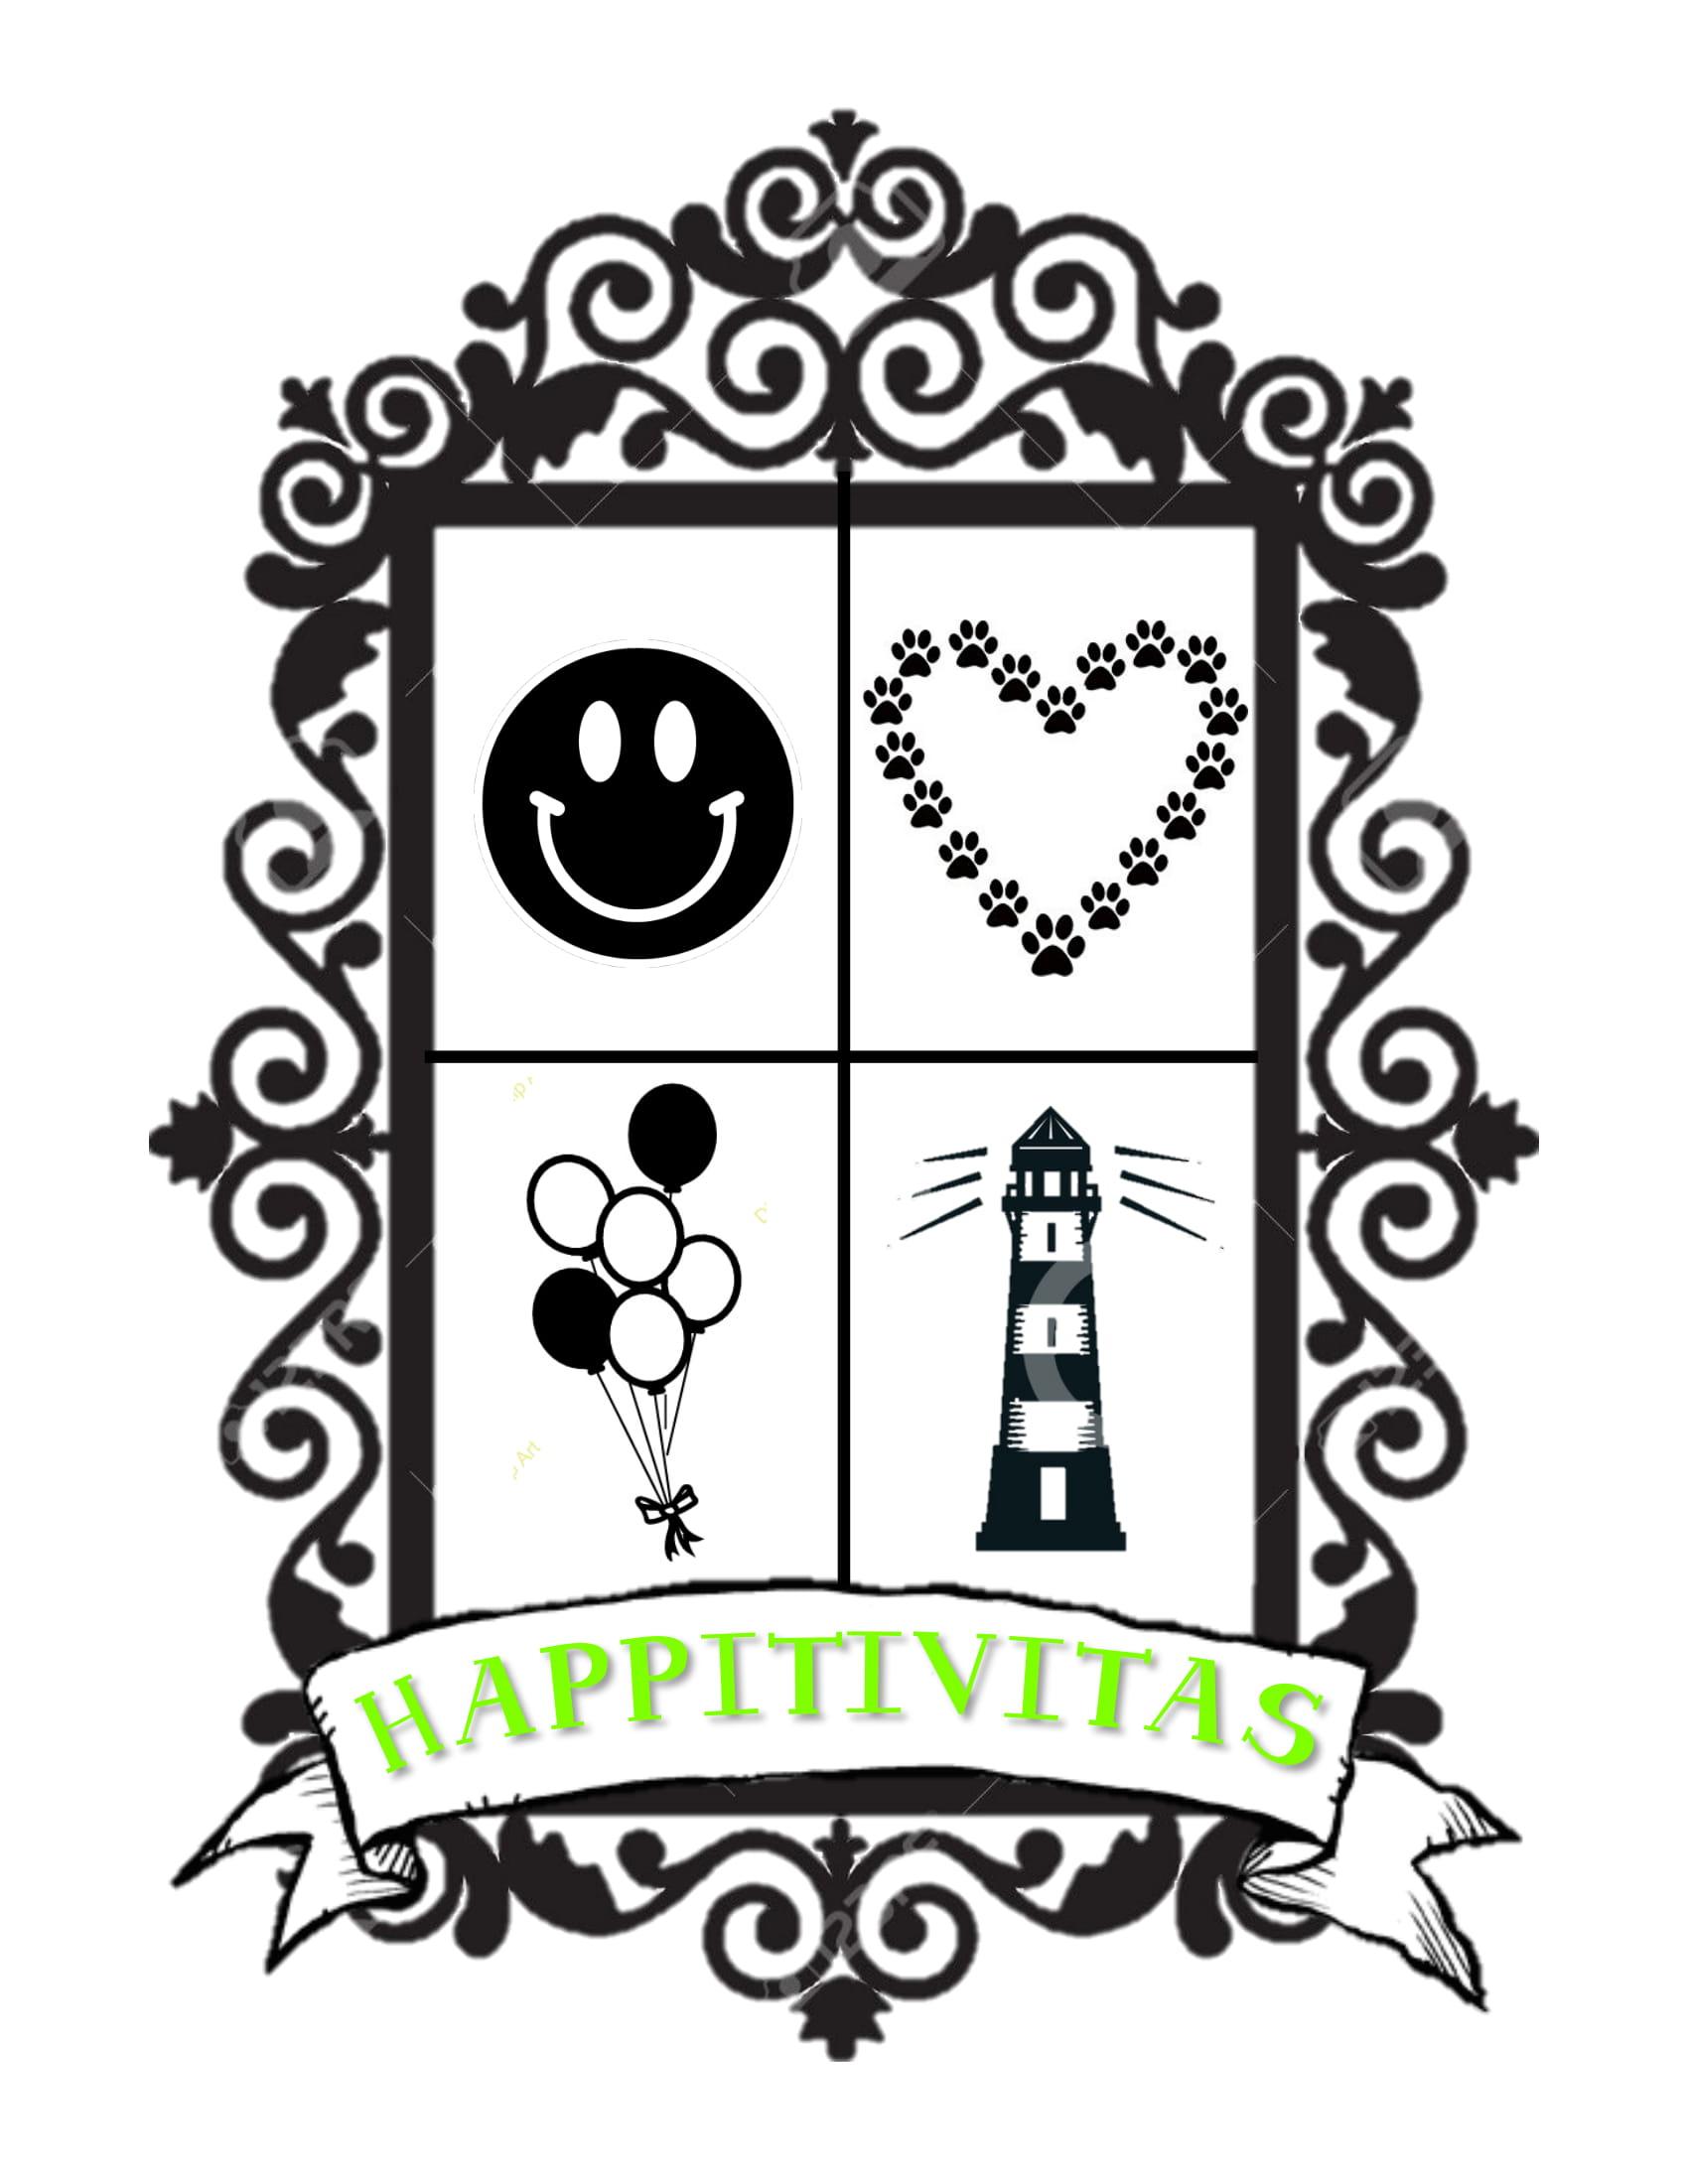 Happitivitas crest